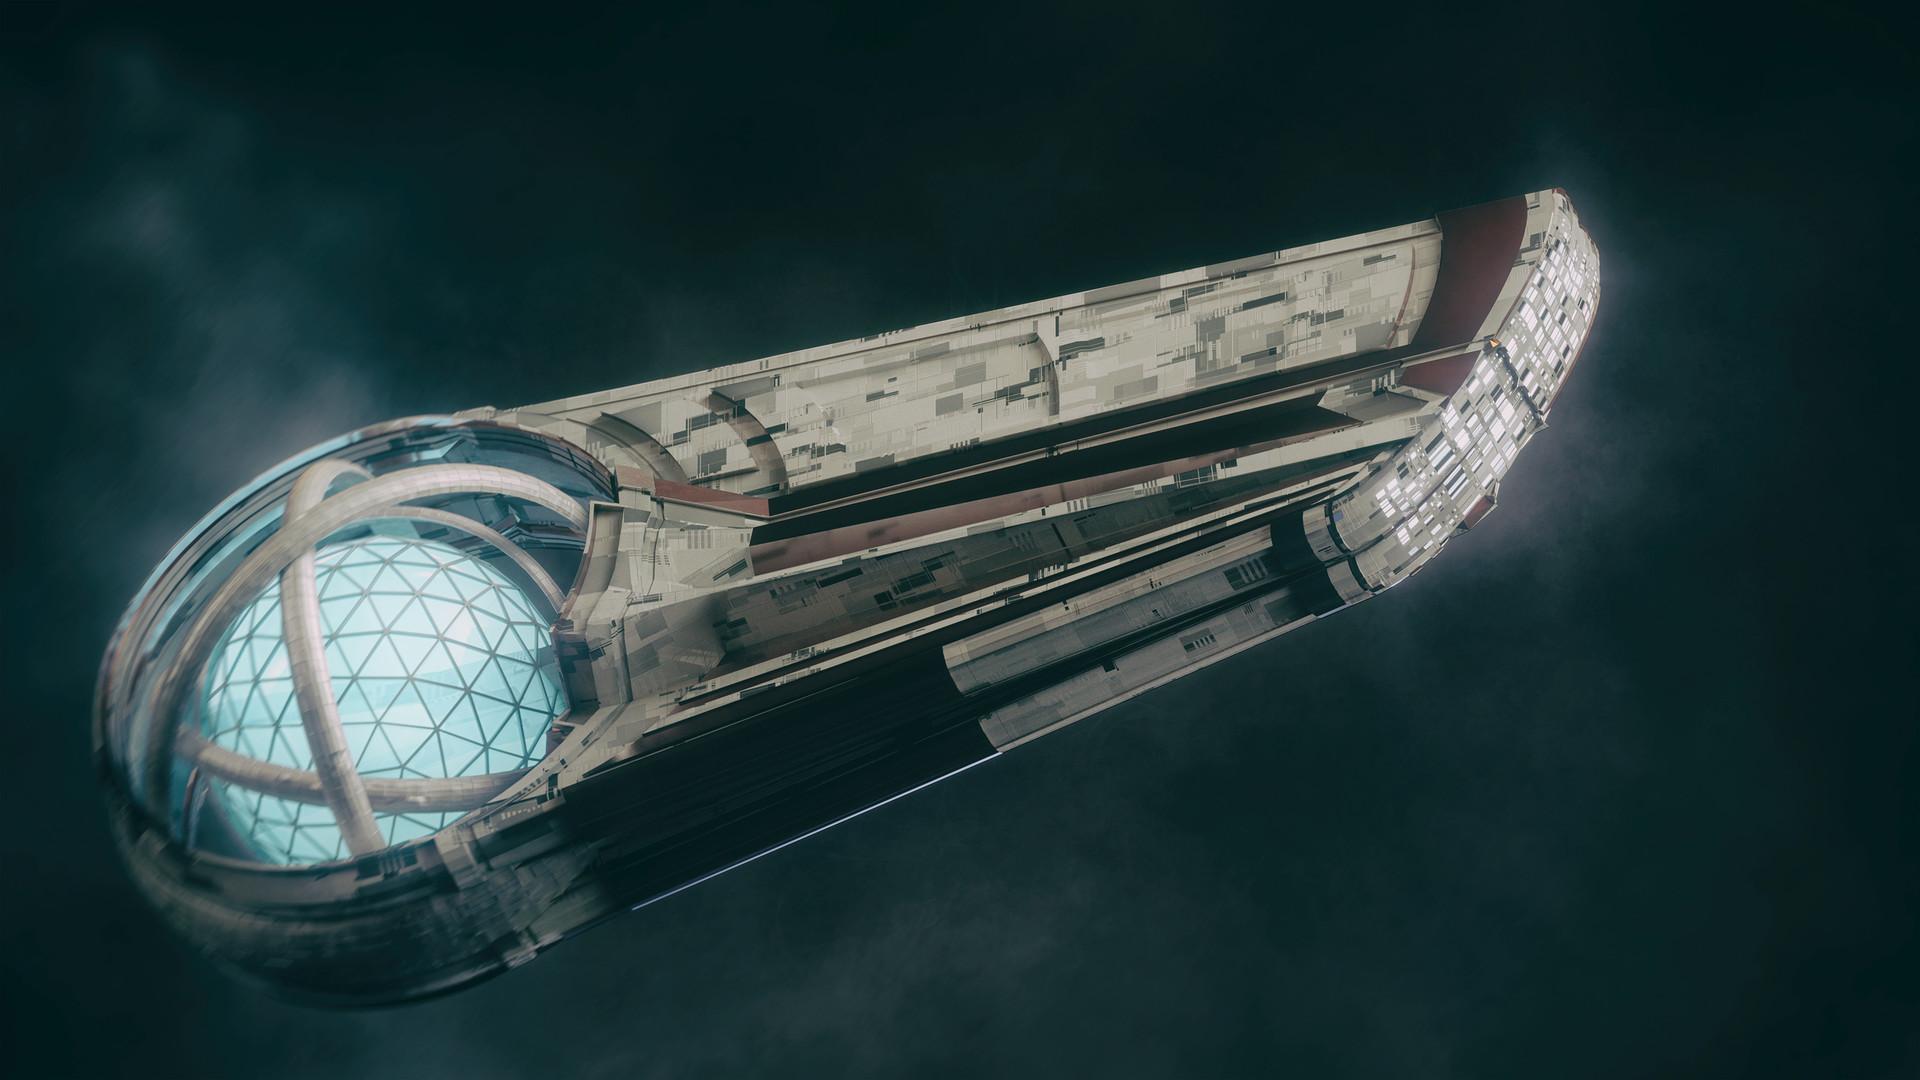 Kresimir jelusic robob3ar 154 110316 ship